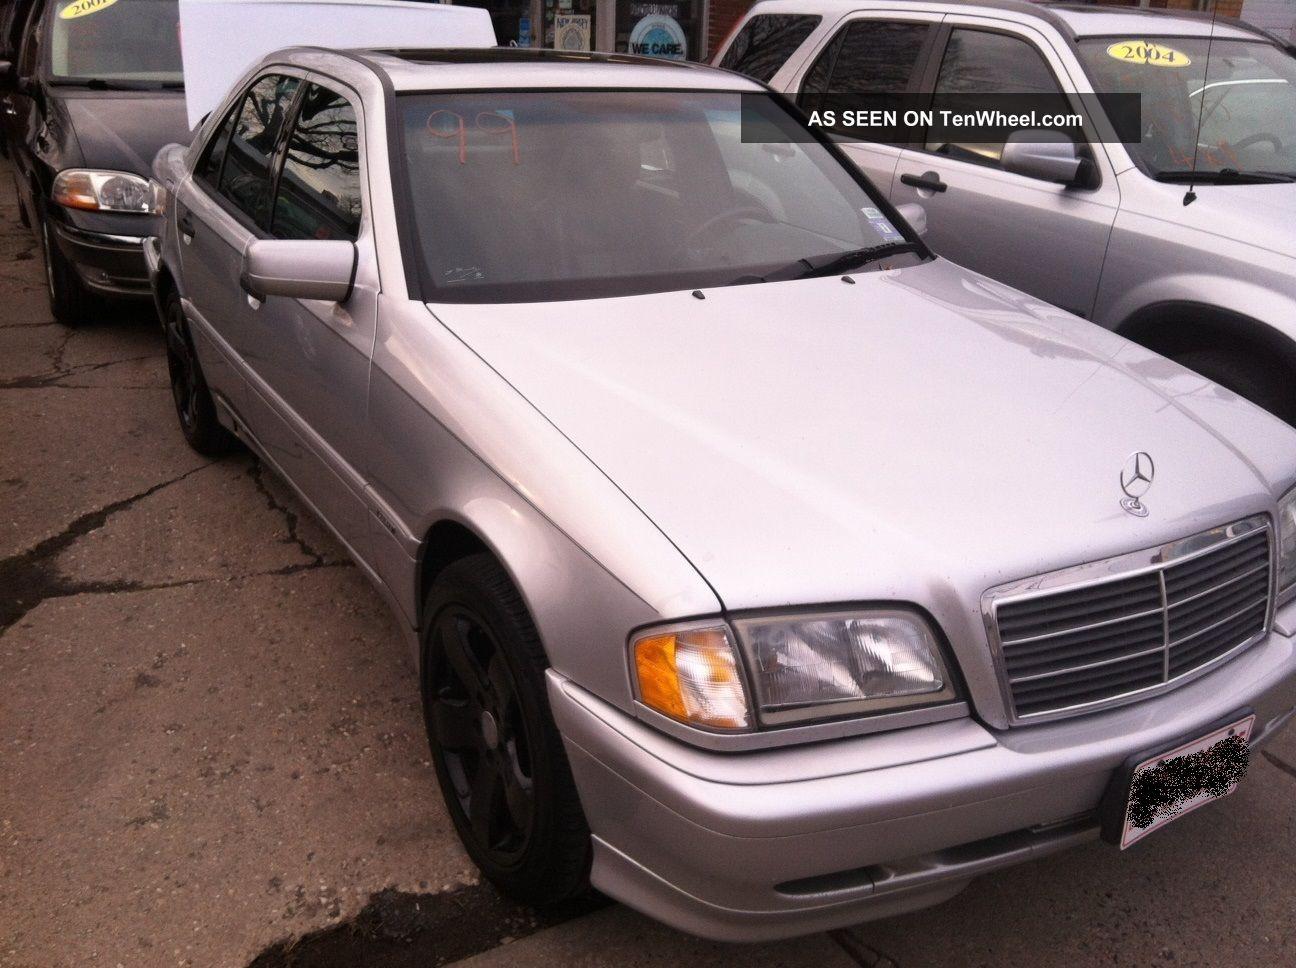 1999 mercedes benz c class c280 no accidents cheap for Mercedes benz cheapest car